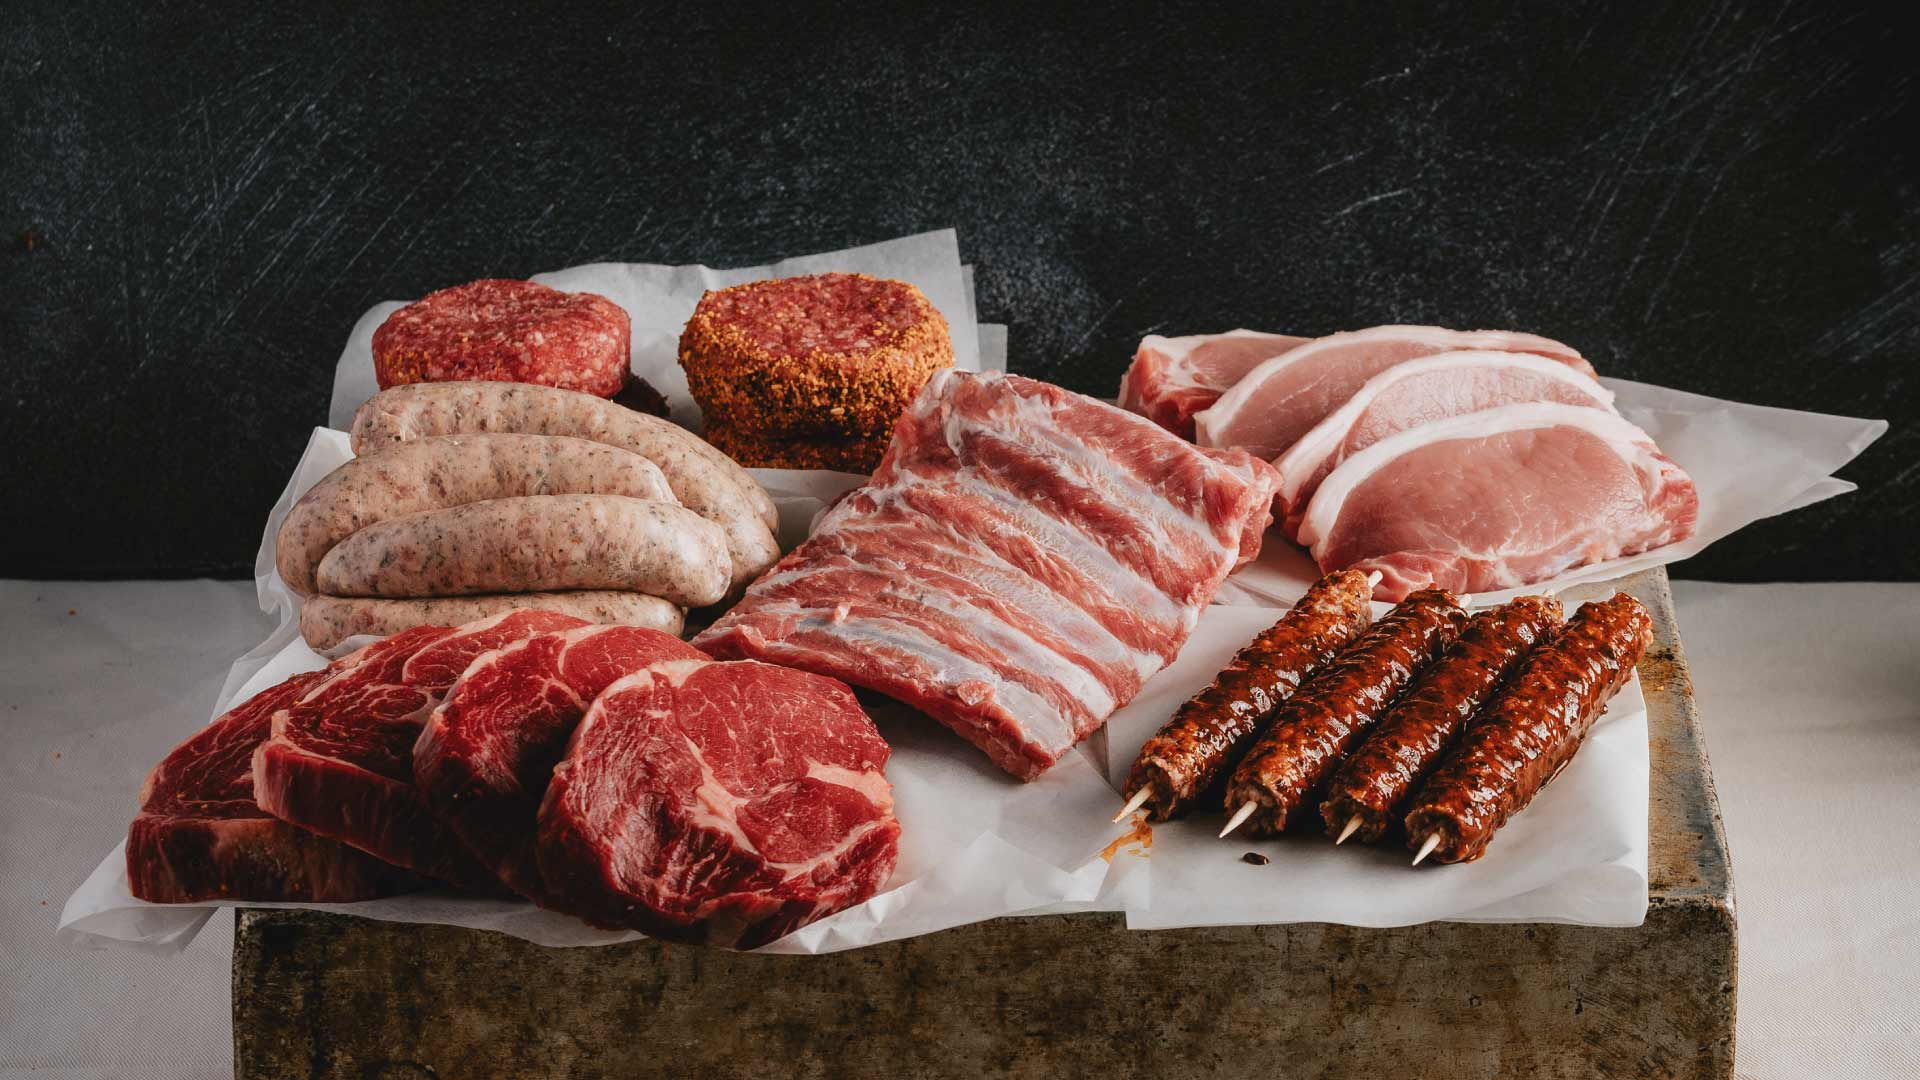 BBQ Season is just around the corner